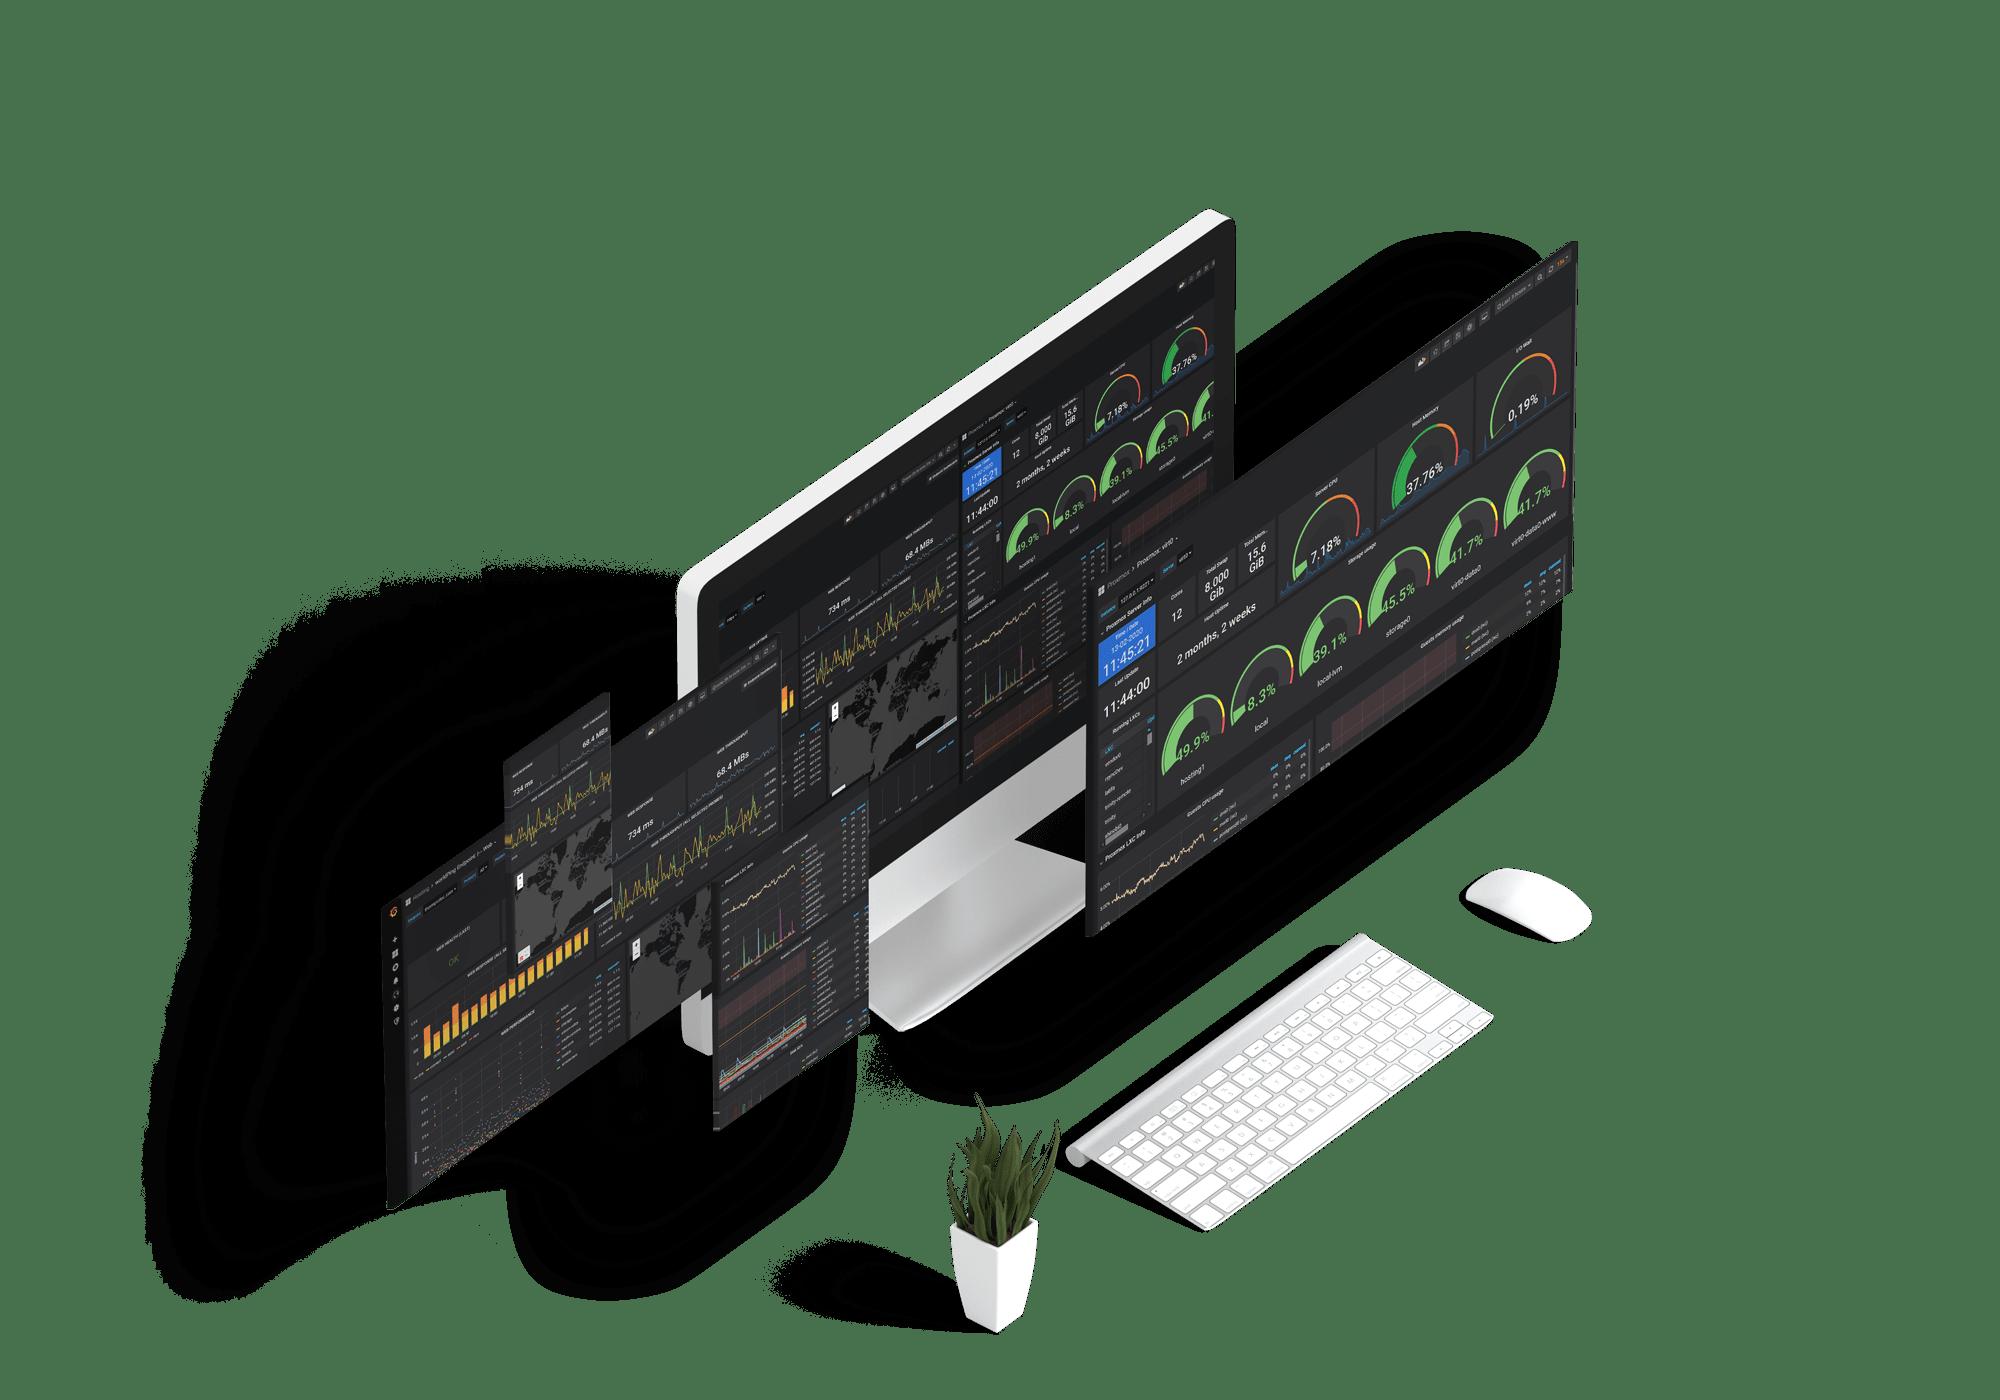 kopfmedia-werbeagentur-offenburg-it-service-firewall-vpn-monitoring